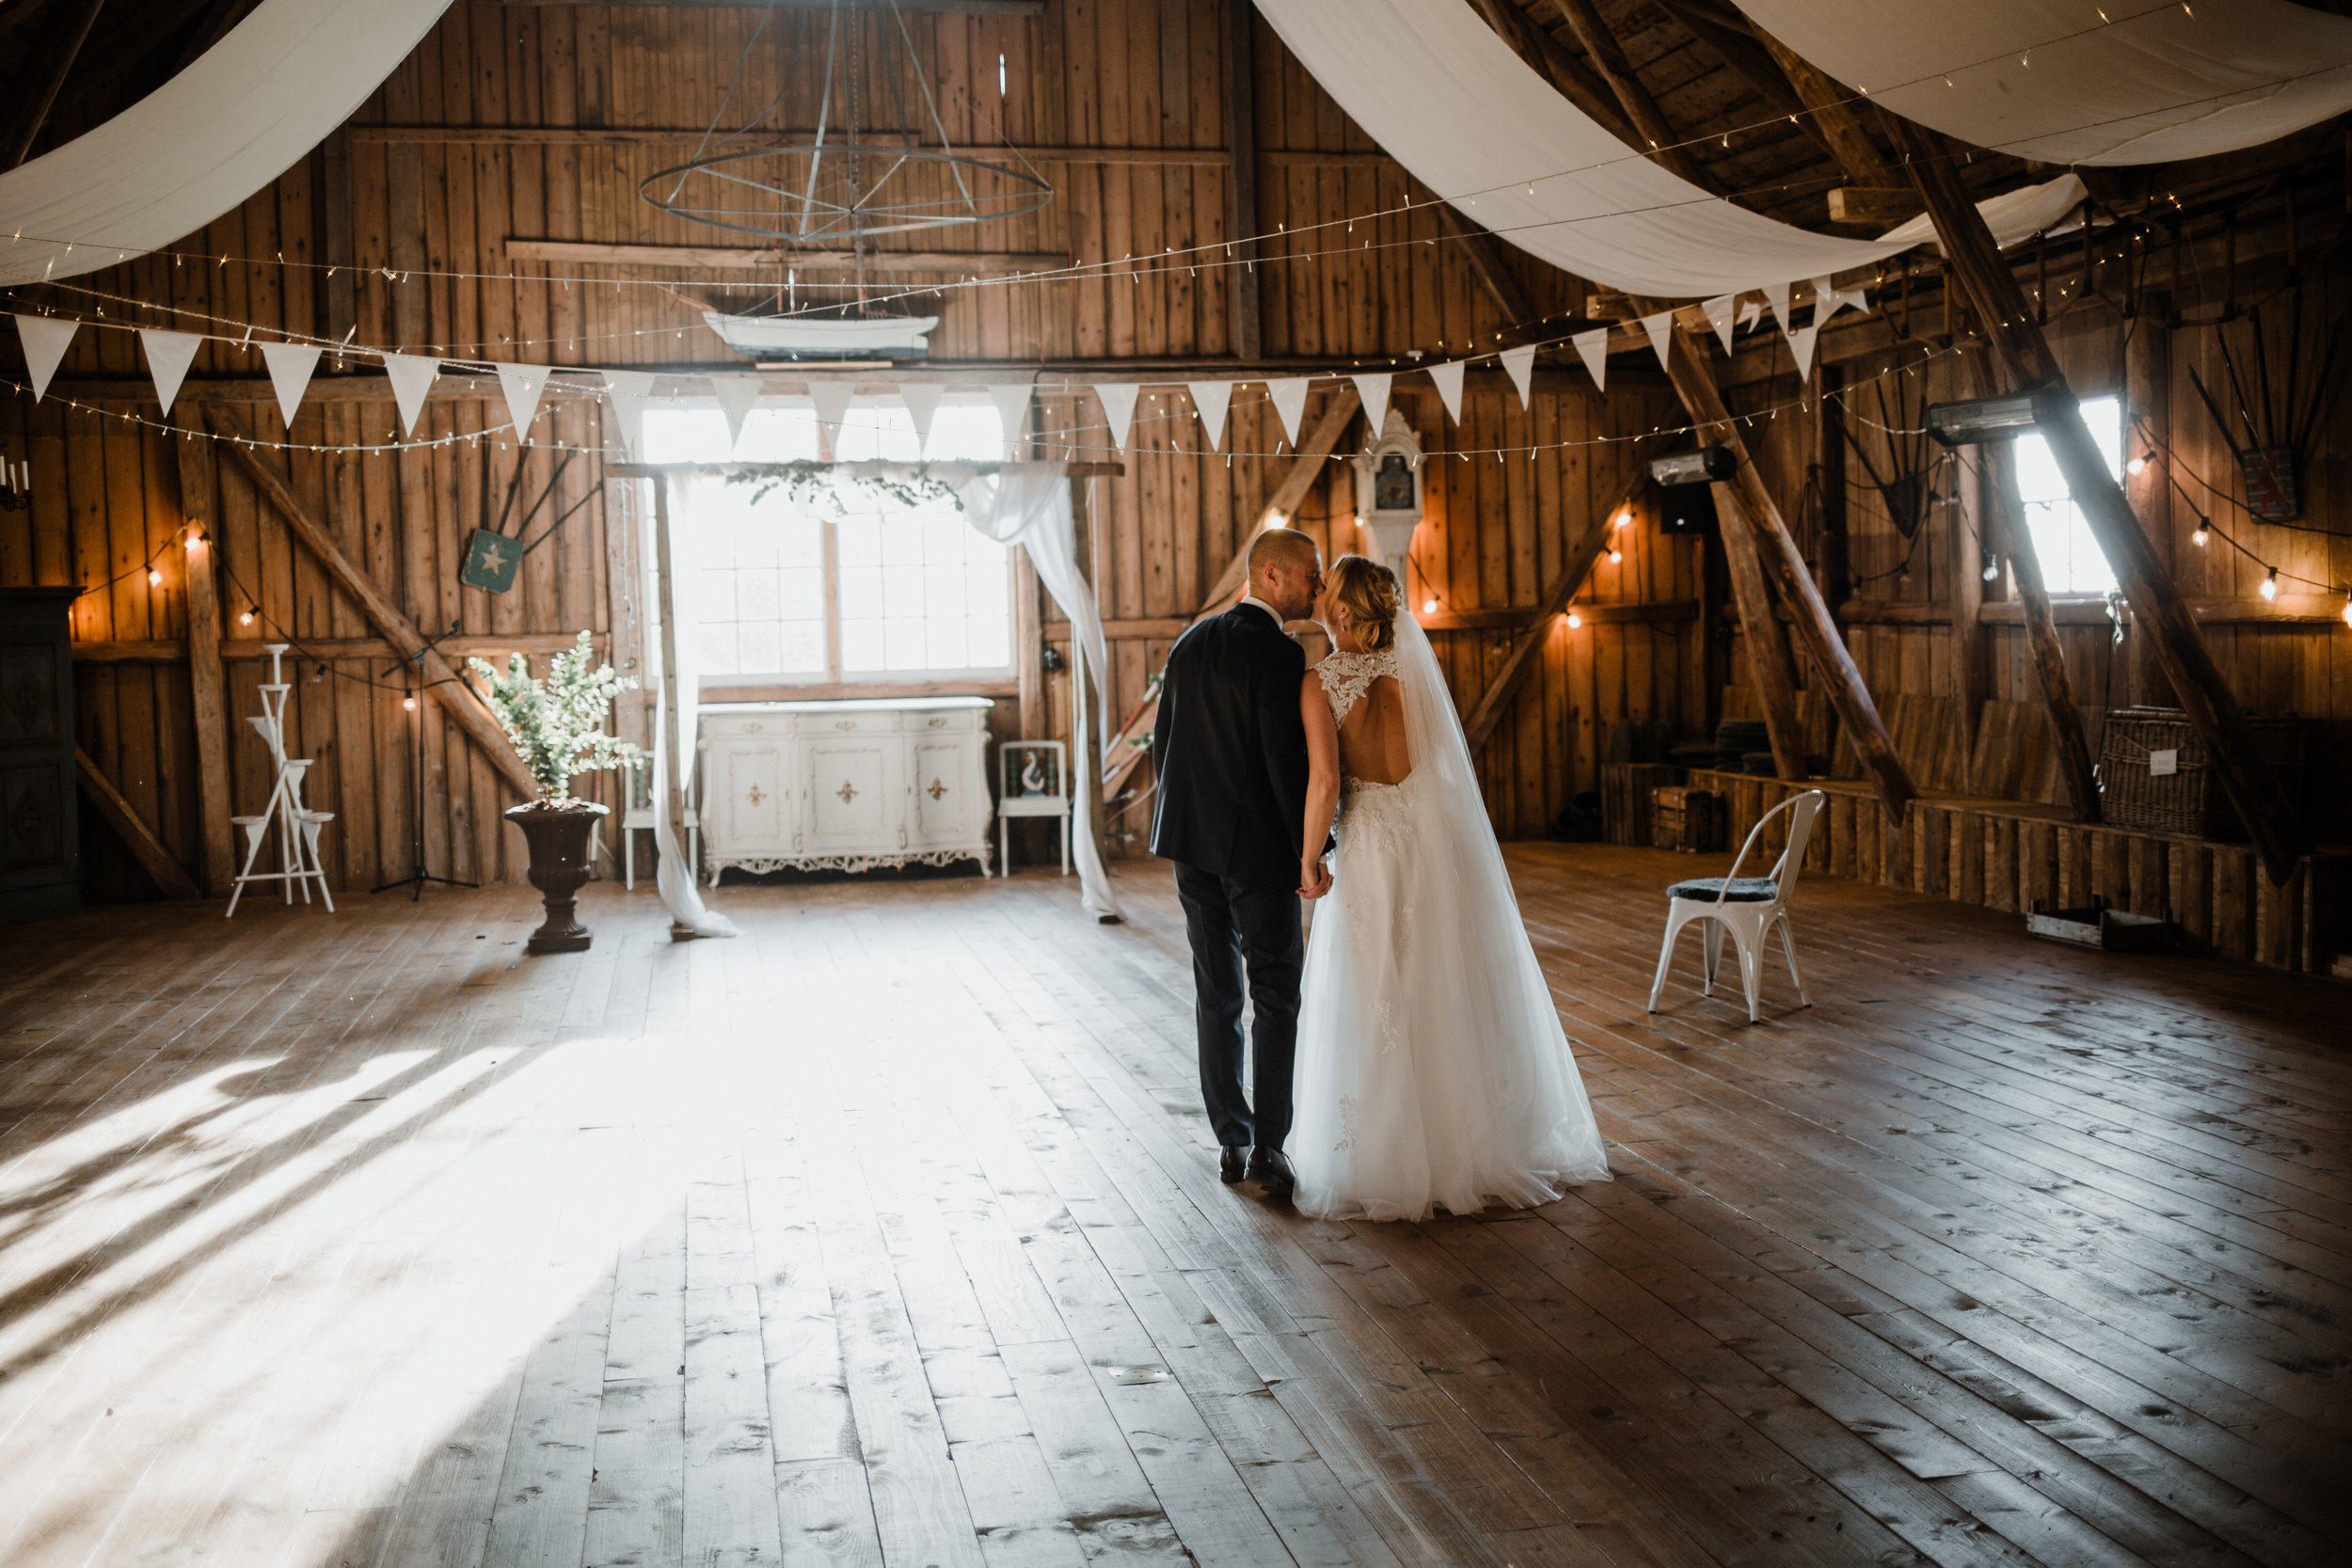 Bröllopsfotograf-Uddetorp Säteri-Höstbröllop-Fotograf Emilia- Bröllopsfotograf Borås-48.jpg